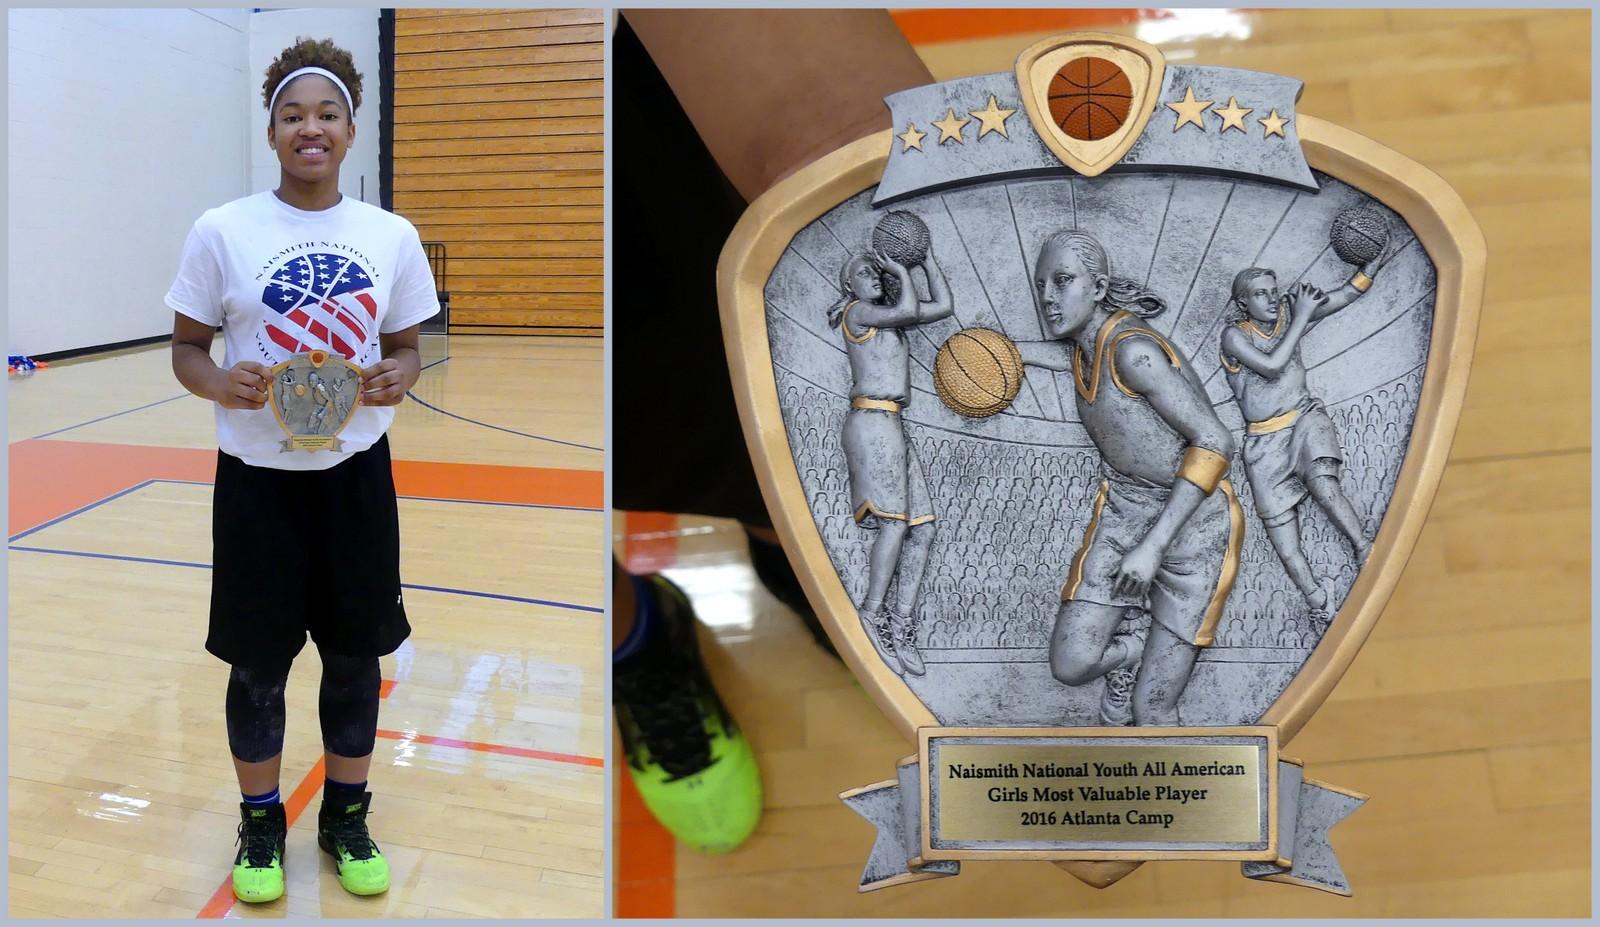 MVP: Naismith All-American Camp